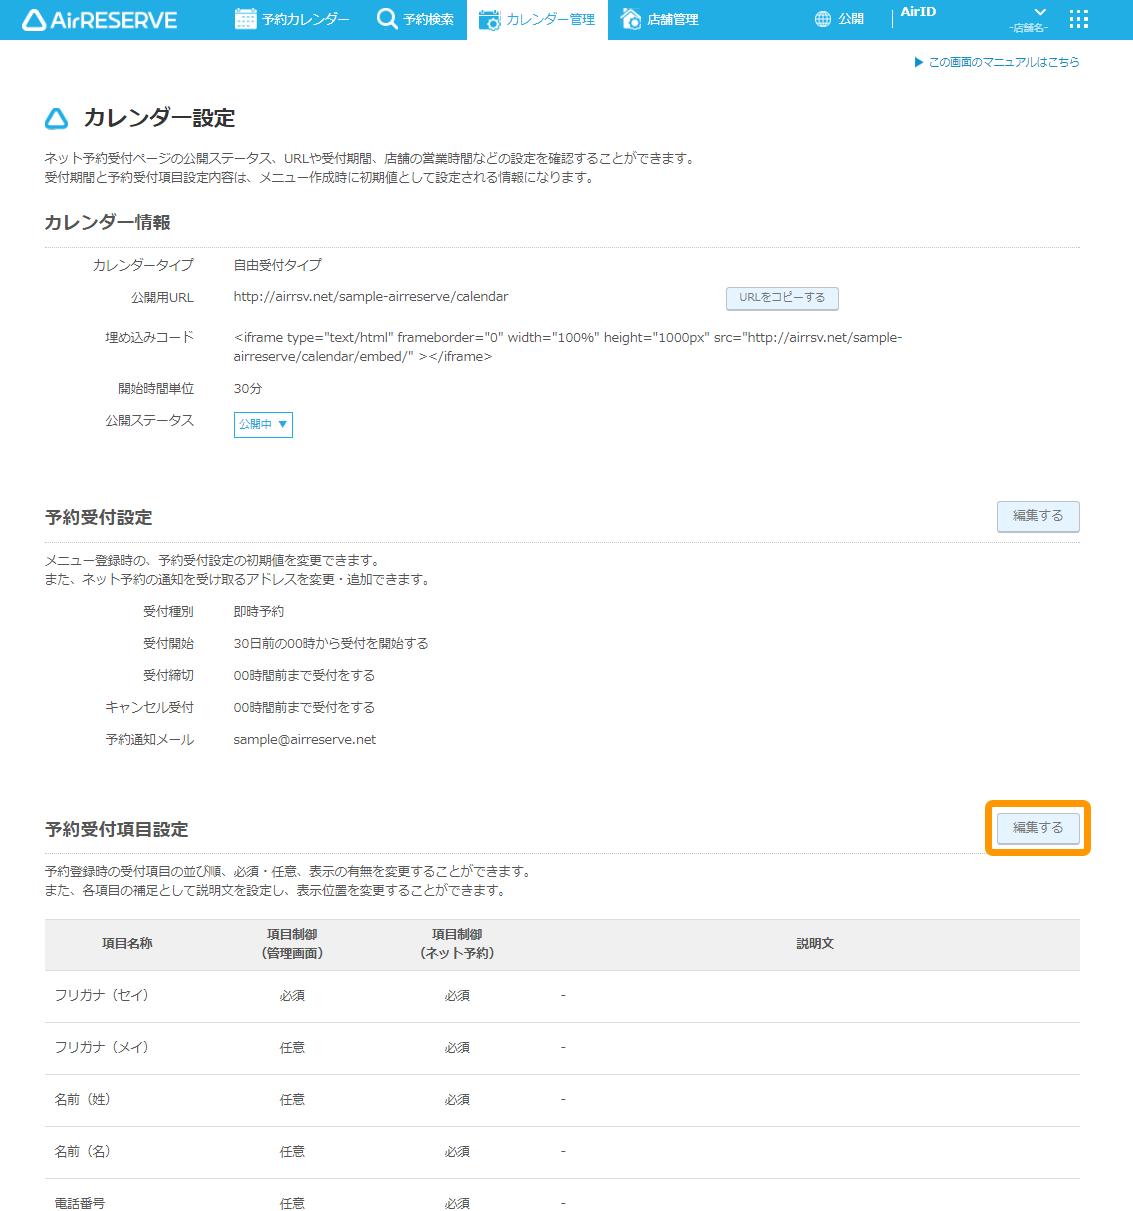 Airリザーブ カレンダー設定画面 予約受付項目設定